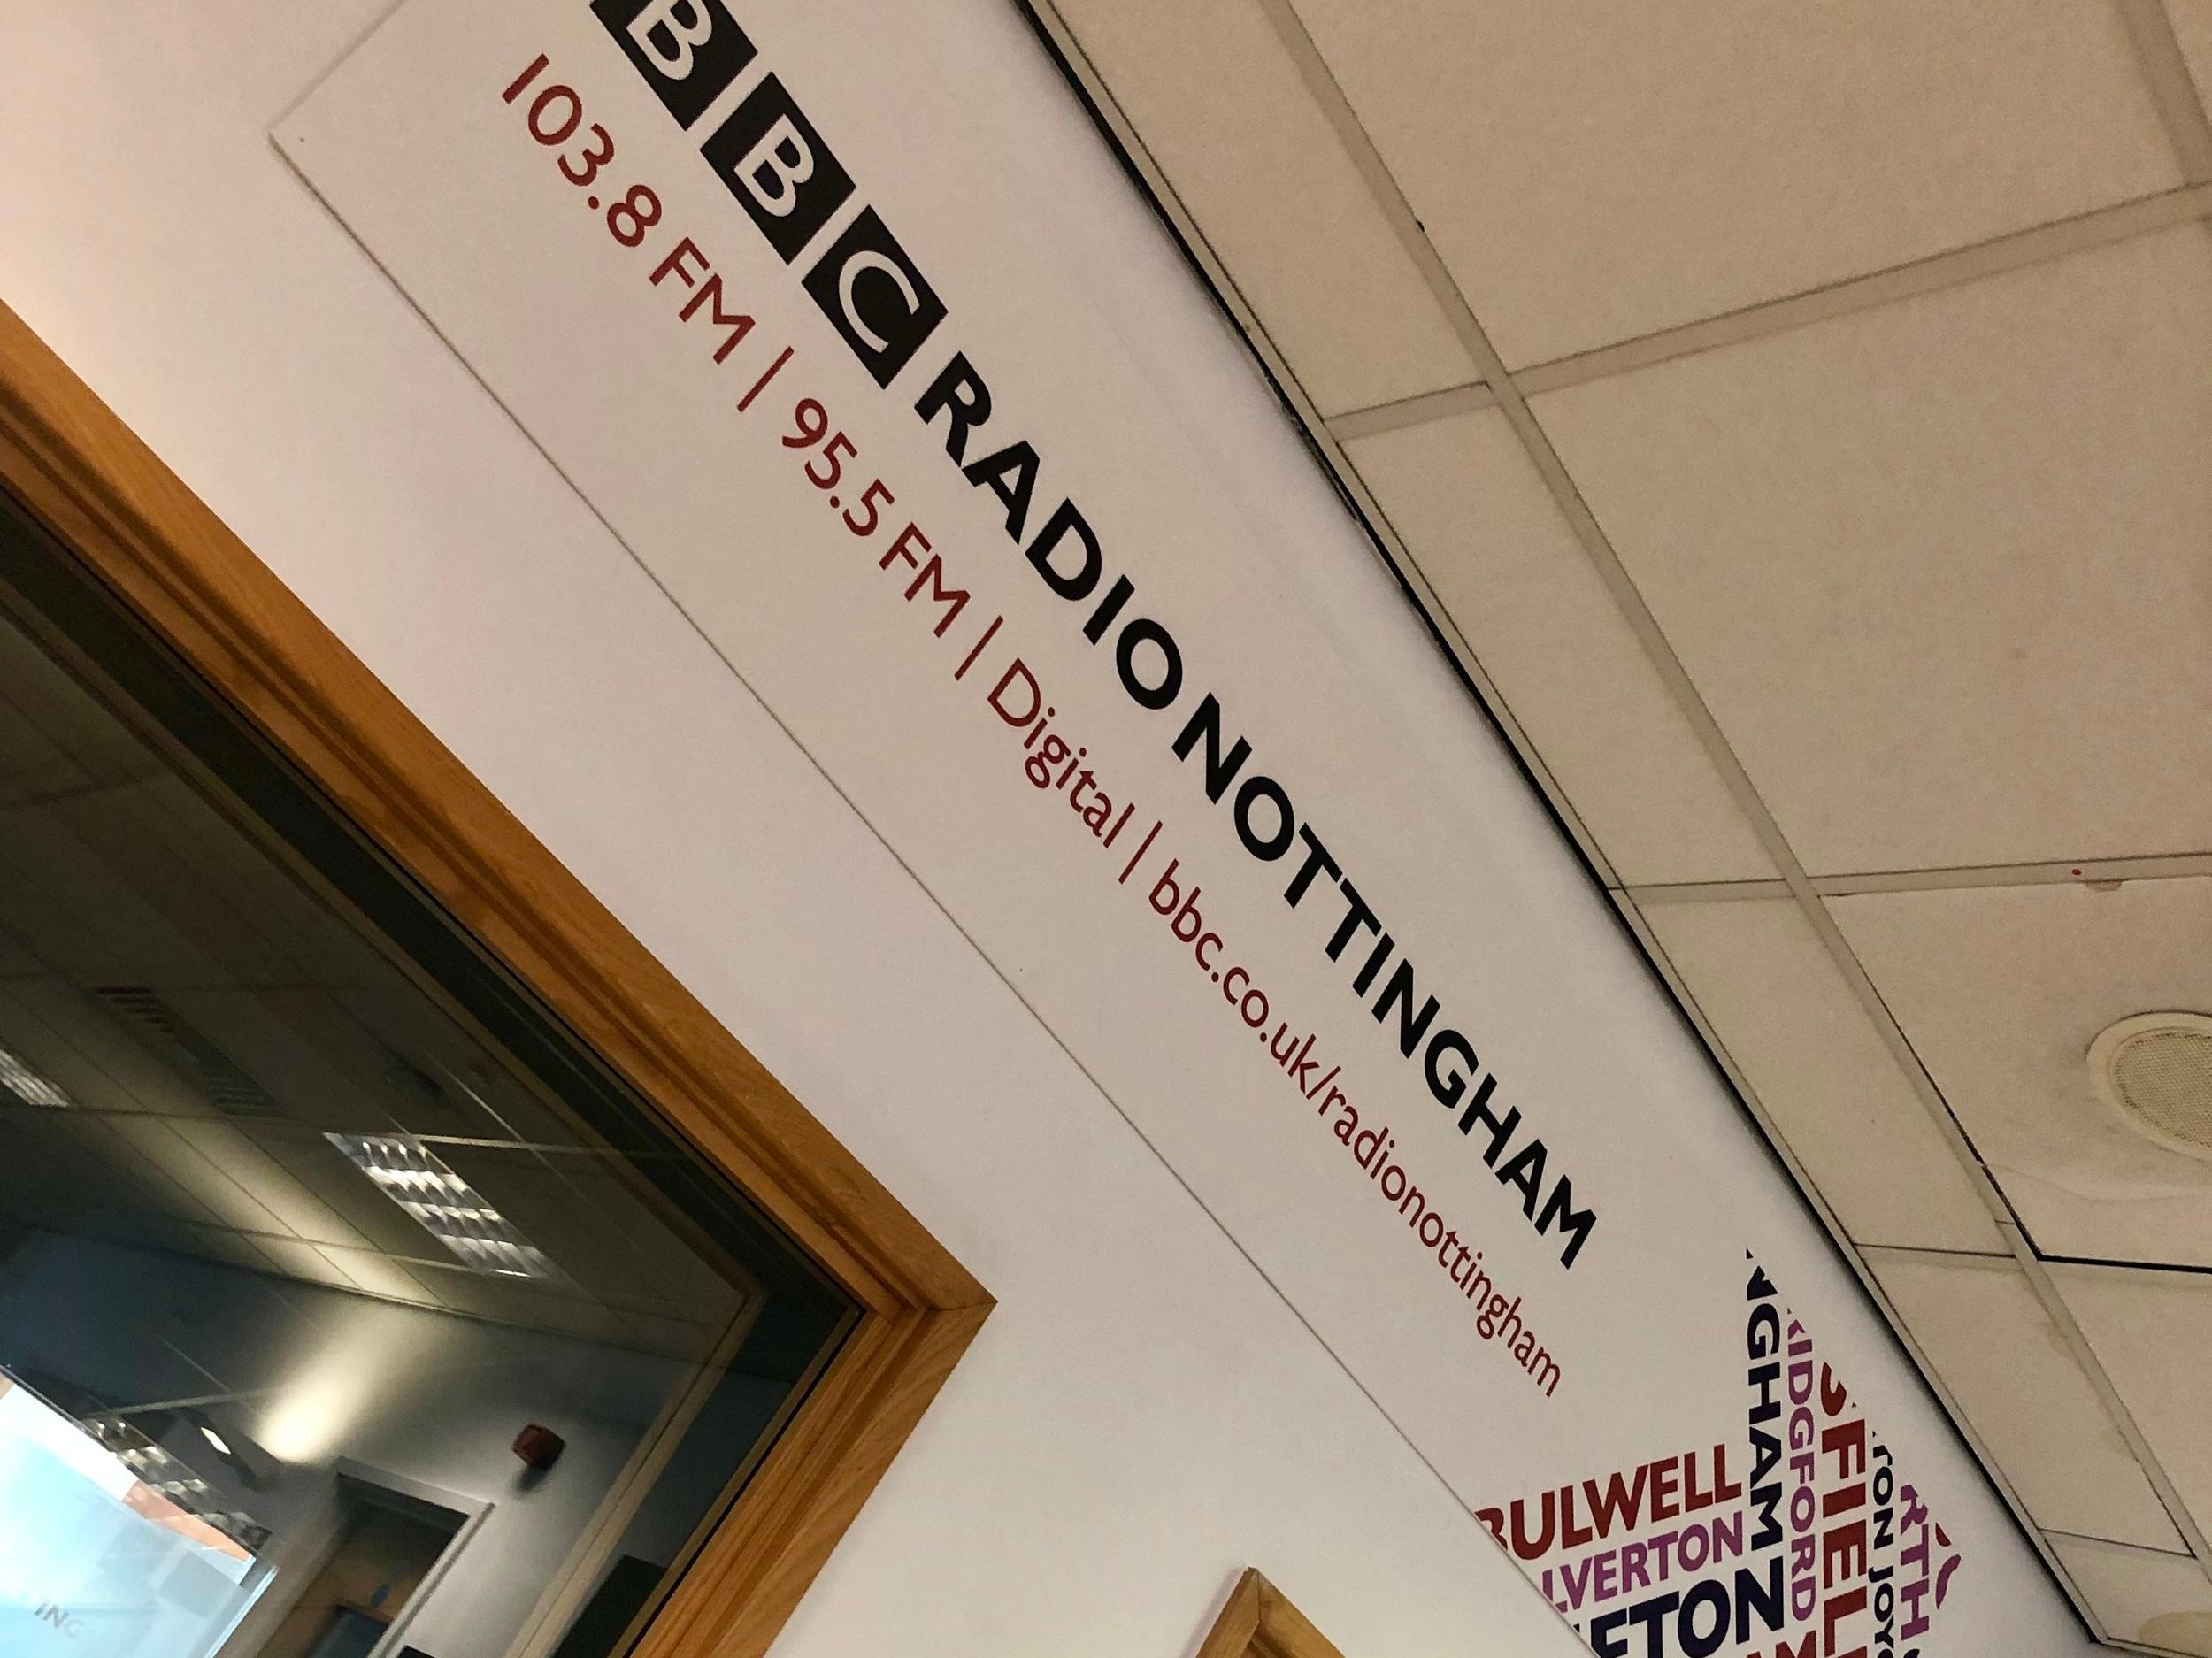 The studio of BBC Radio Nottingham to discuss International Day of Yoga 2019